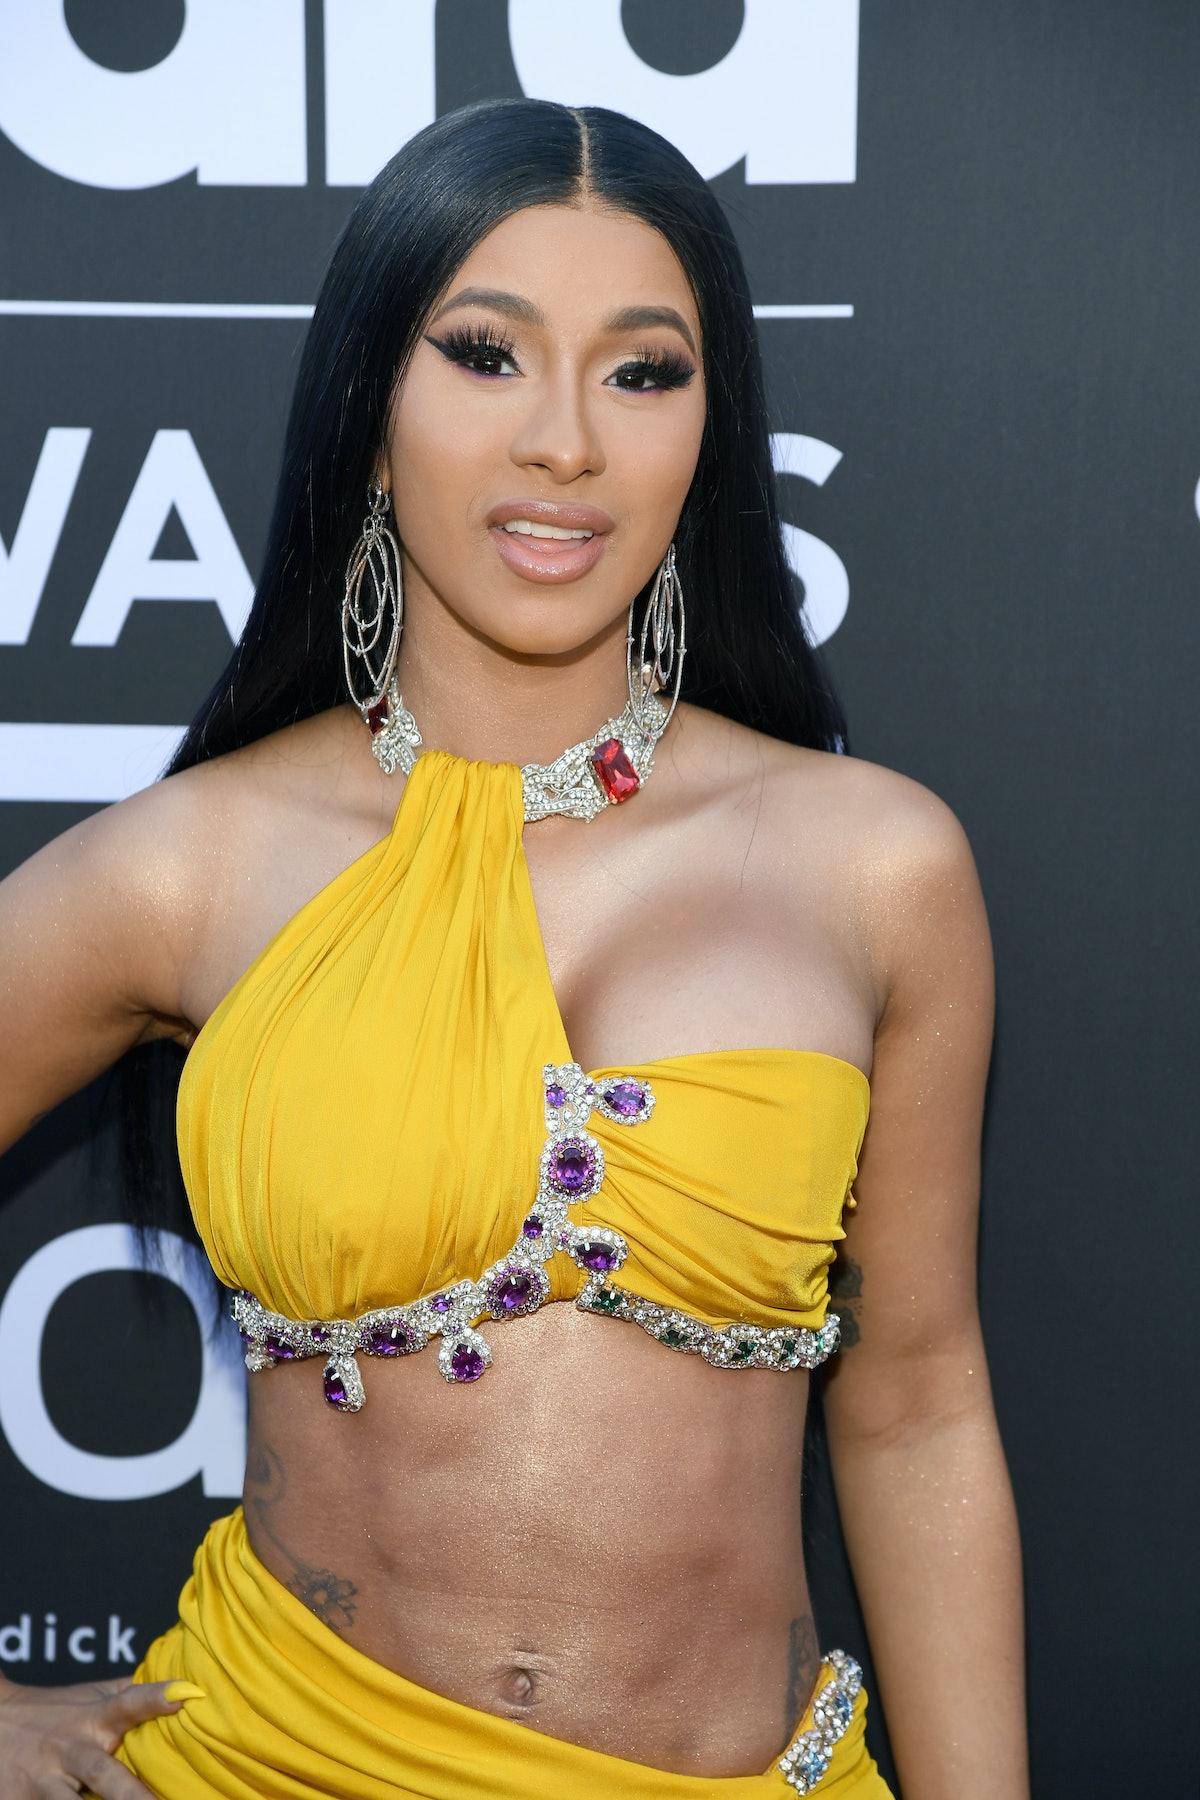 LAS VEGAS, NV - MAY 01:  Cardi B attends the 2019 Billboard Music Awards at MGM Grand Garden Arena o...